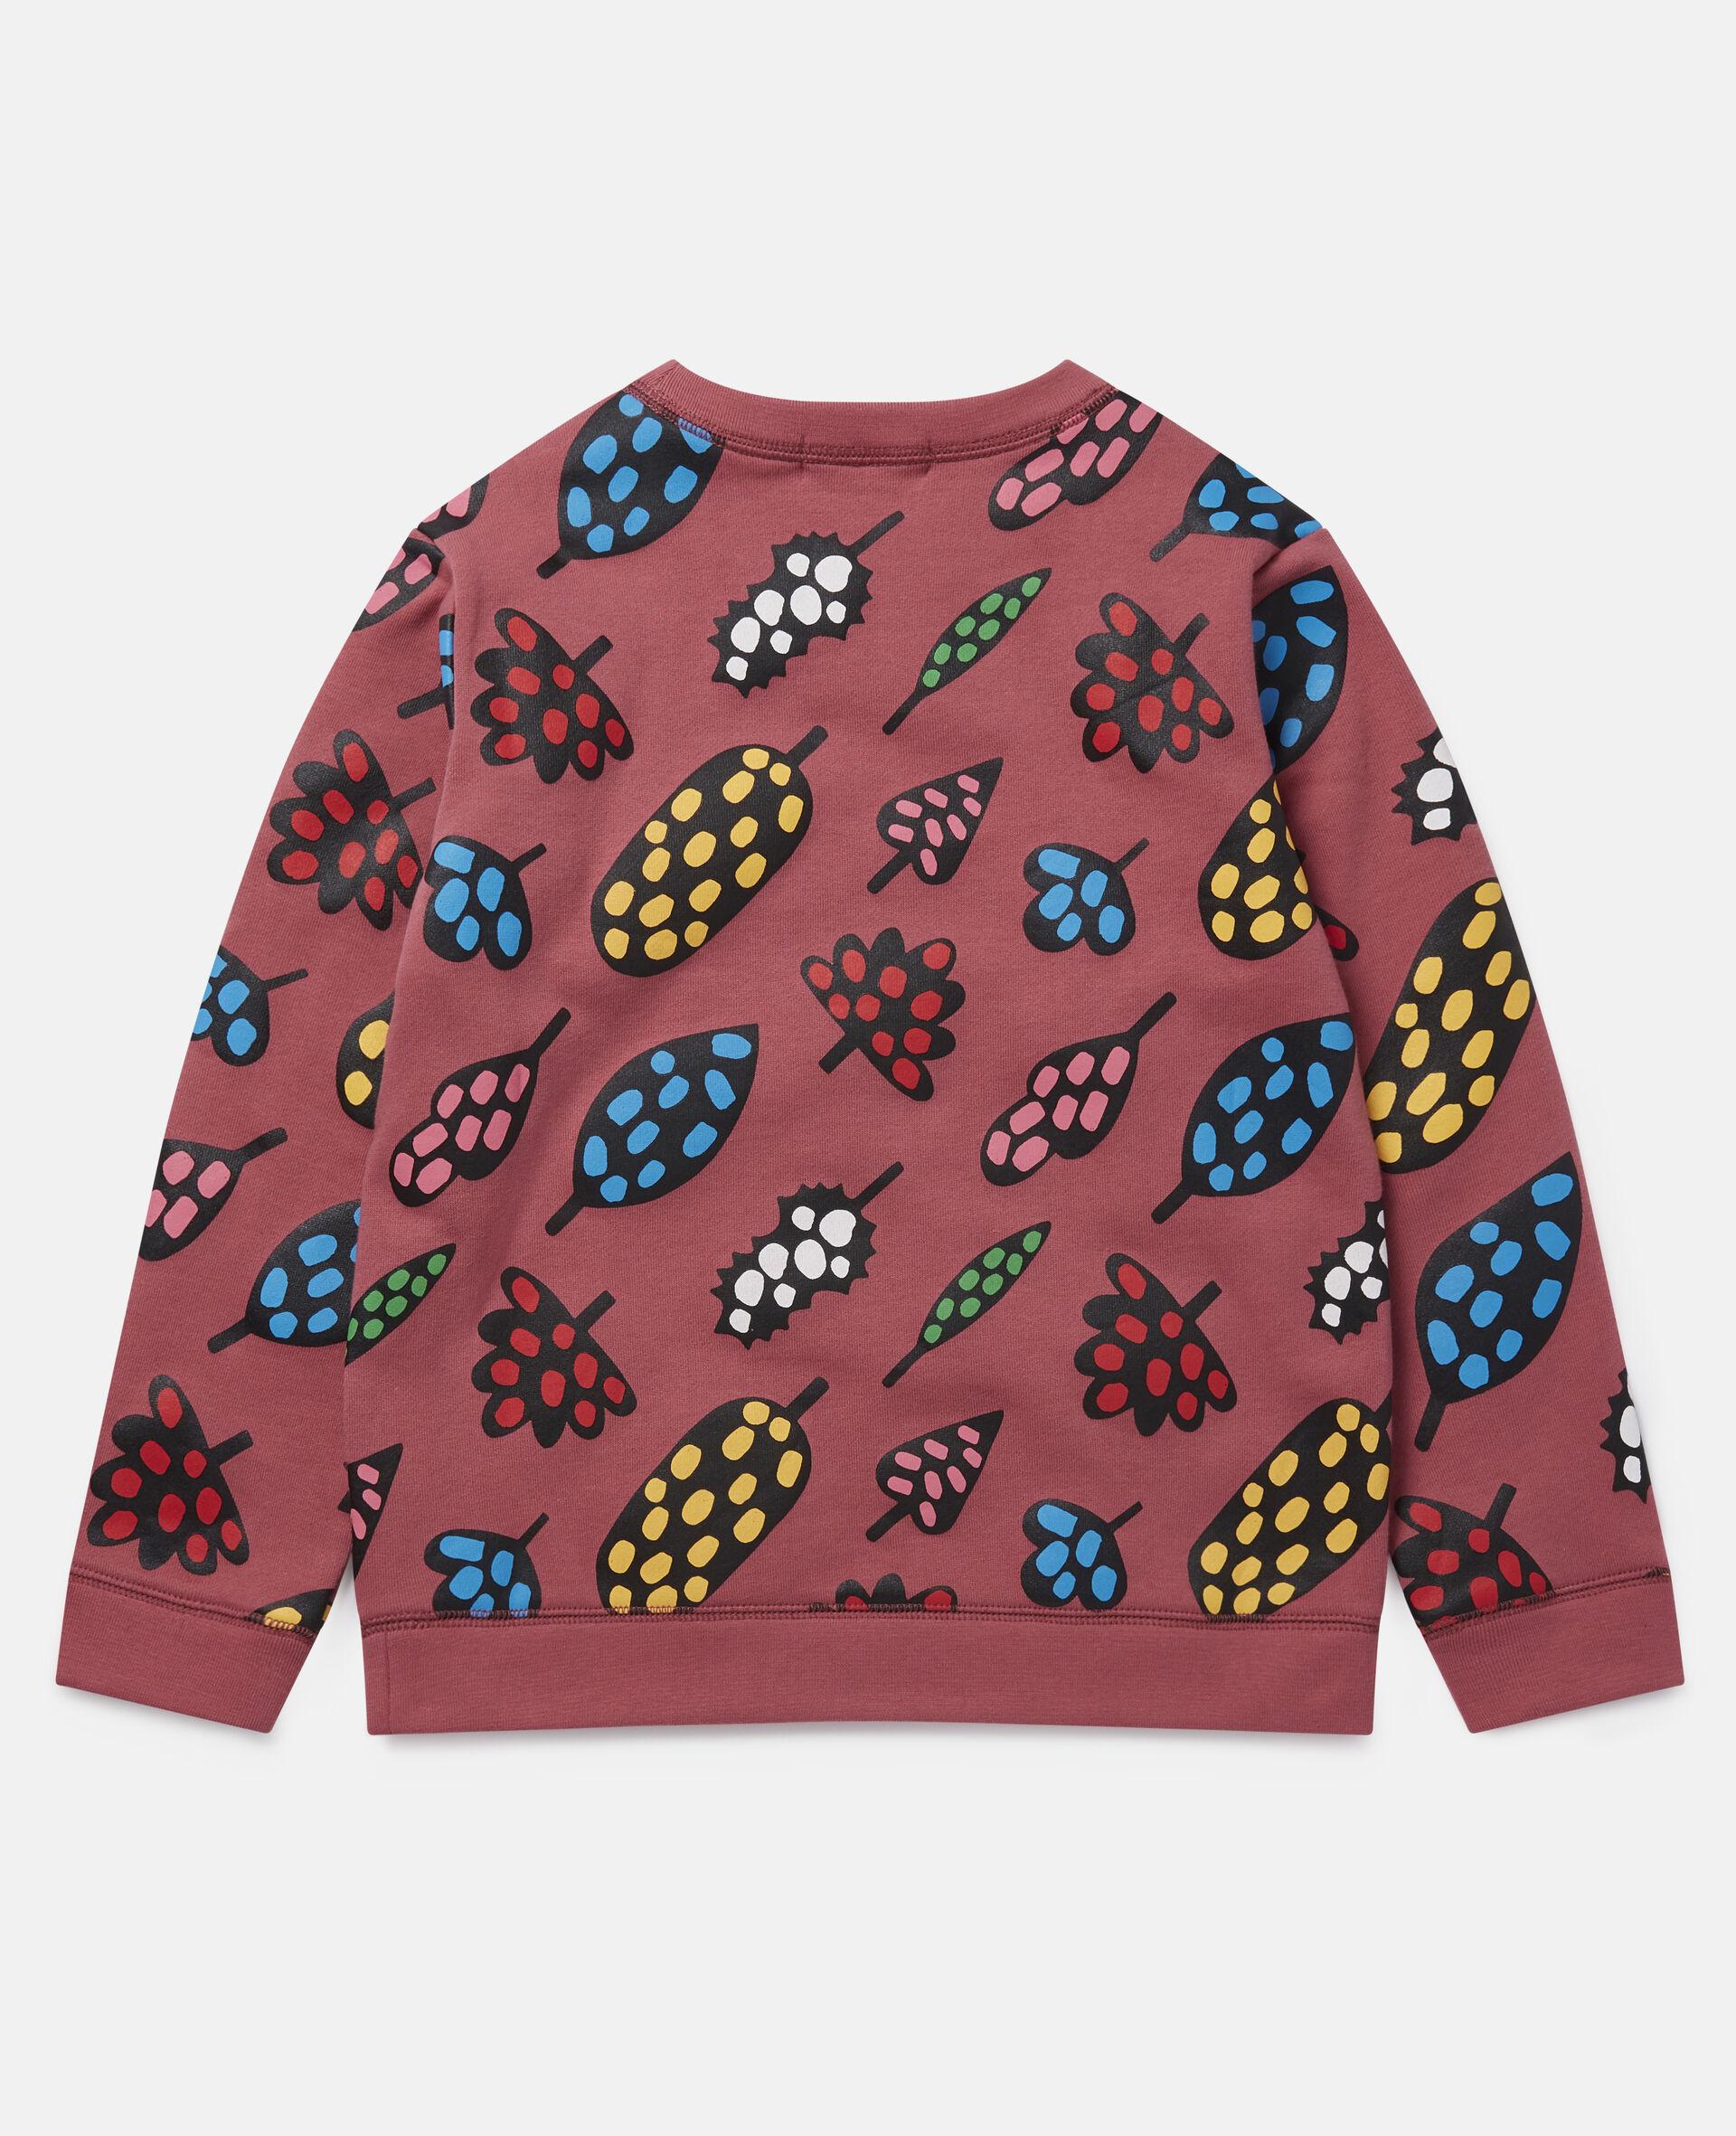 Spotty Leaves Cotton Fleece Sweatshirt -Multicolour-large image number 3